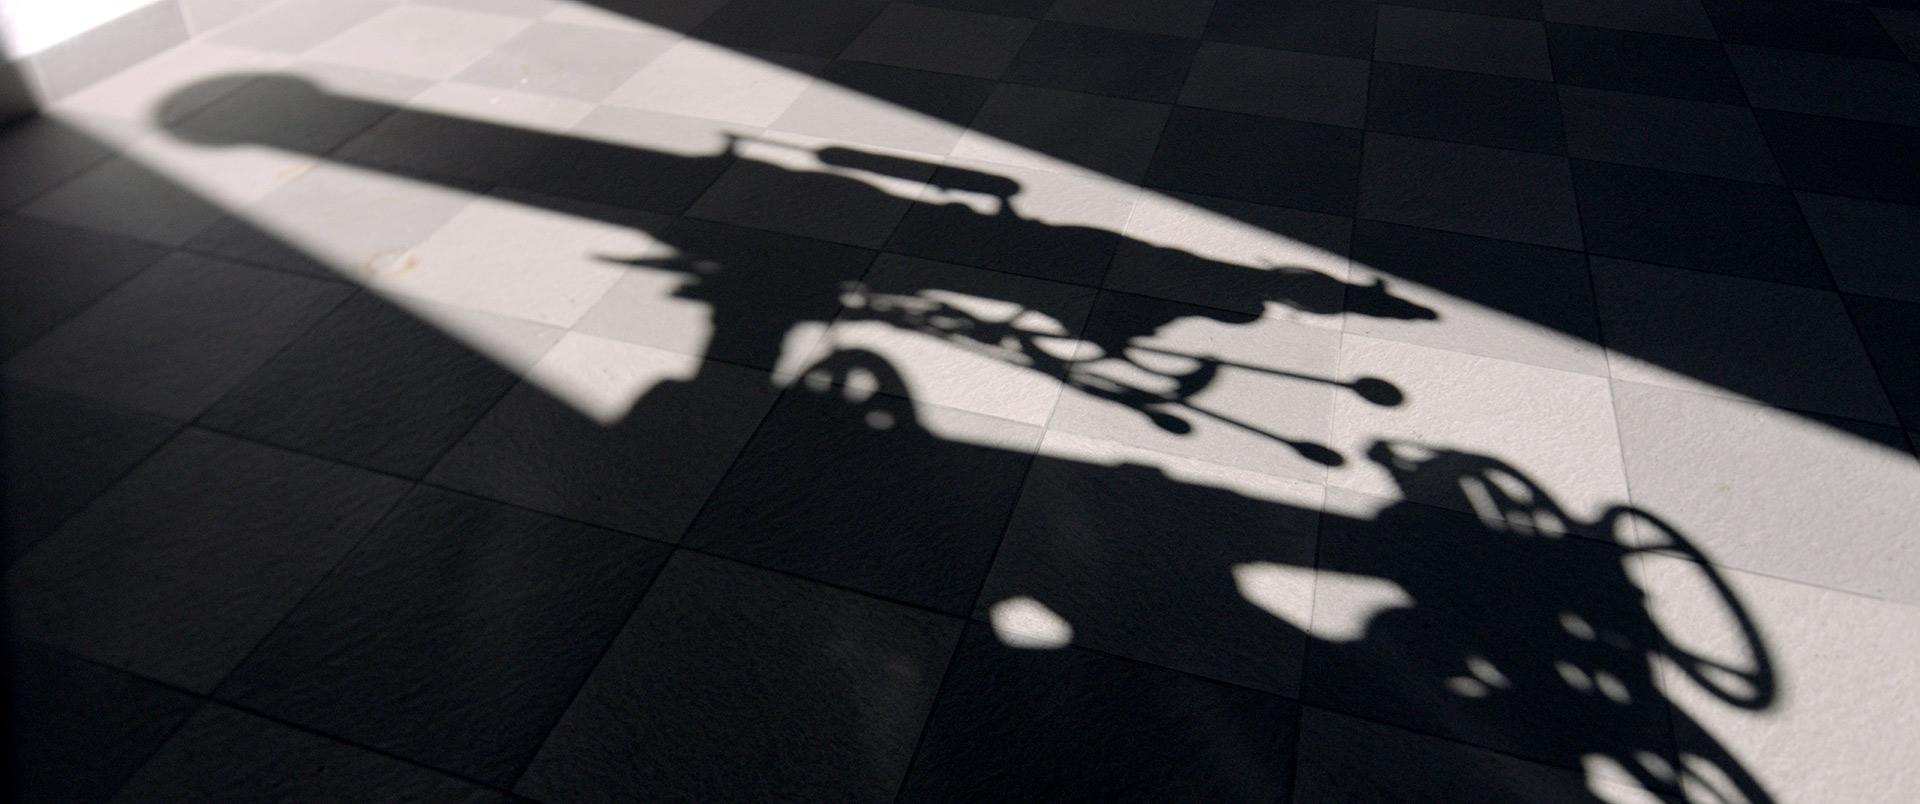 The-Farthest-Image_5.jpg